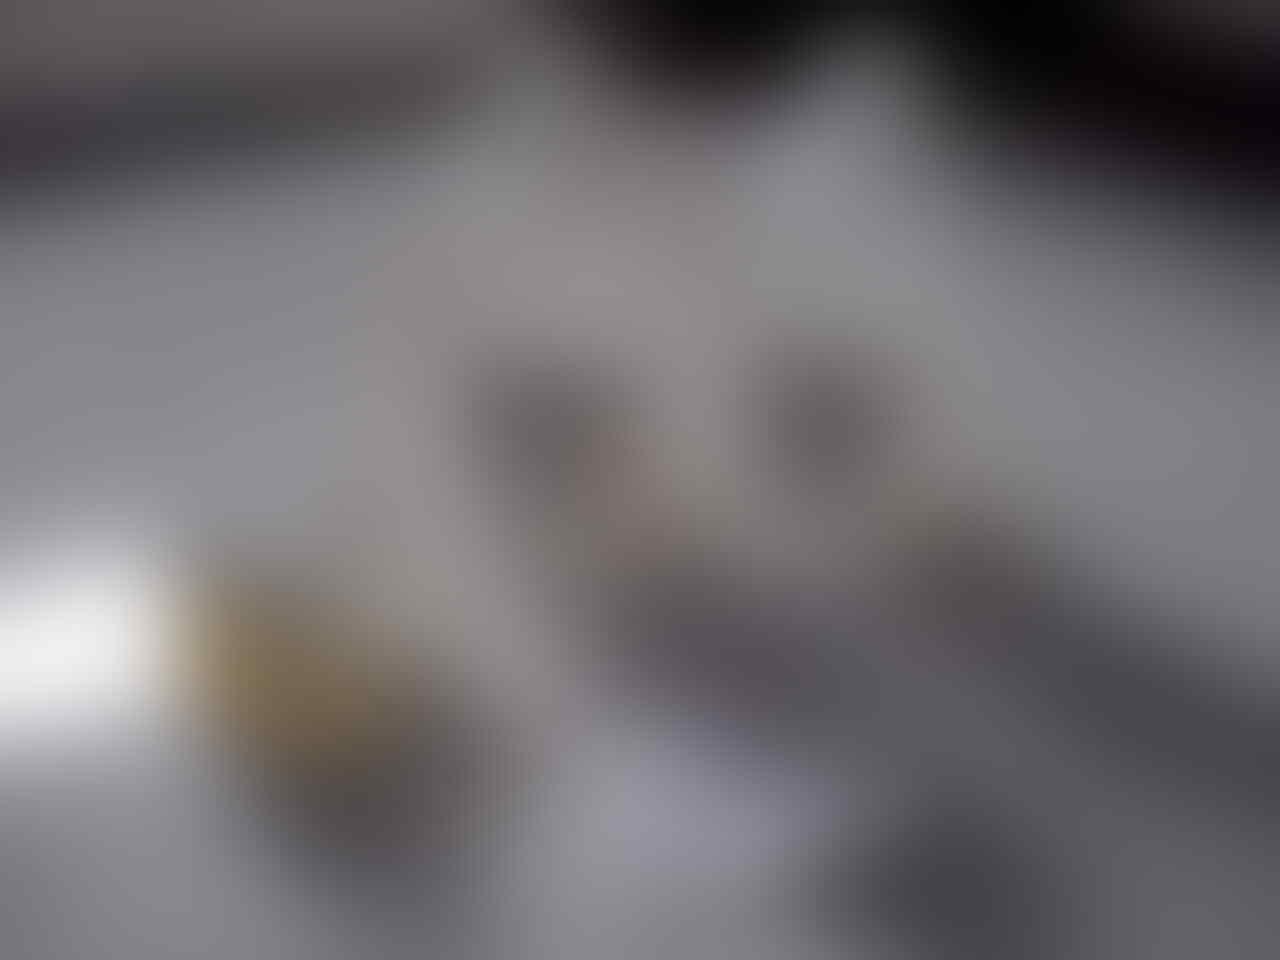 Propelyne Glycol PG &Vegetable Glycerine VG Brataco, DIY E liquid Ejuice bandung